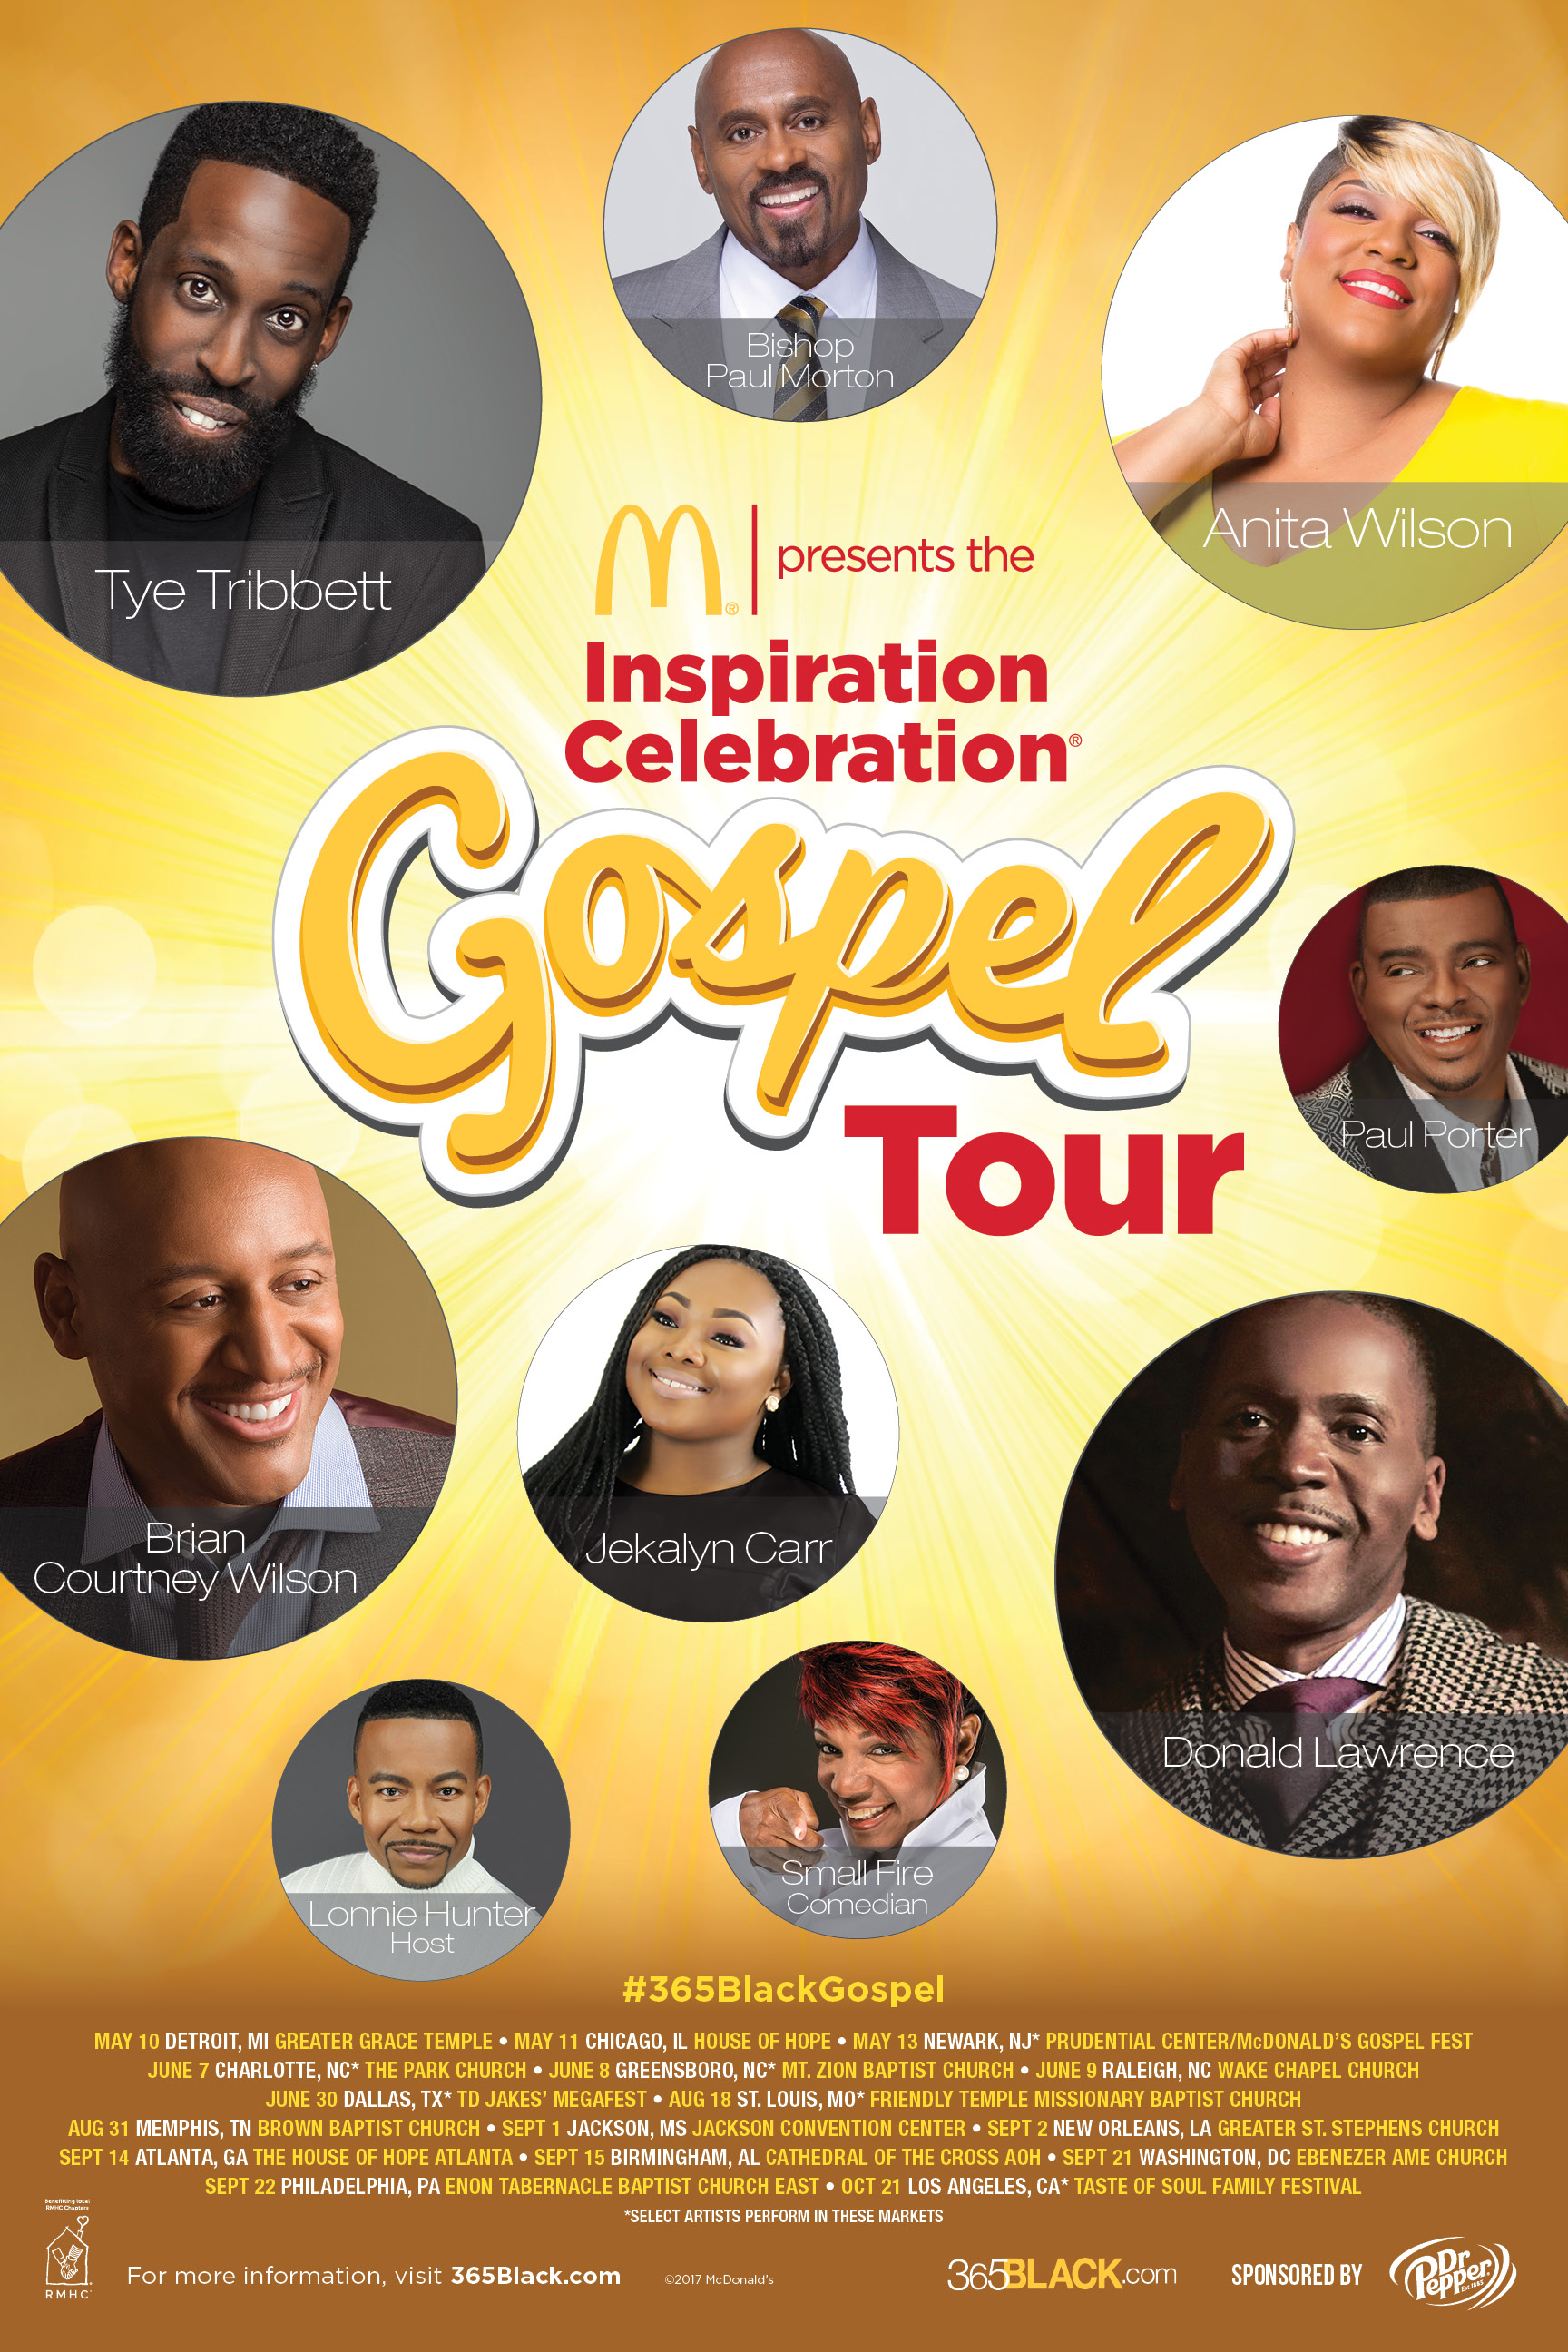 McDonald's Gospel Tour 2017